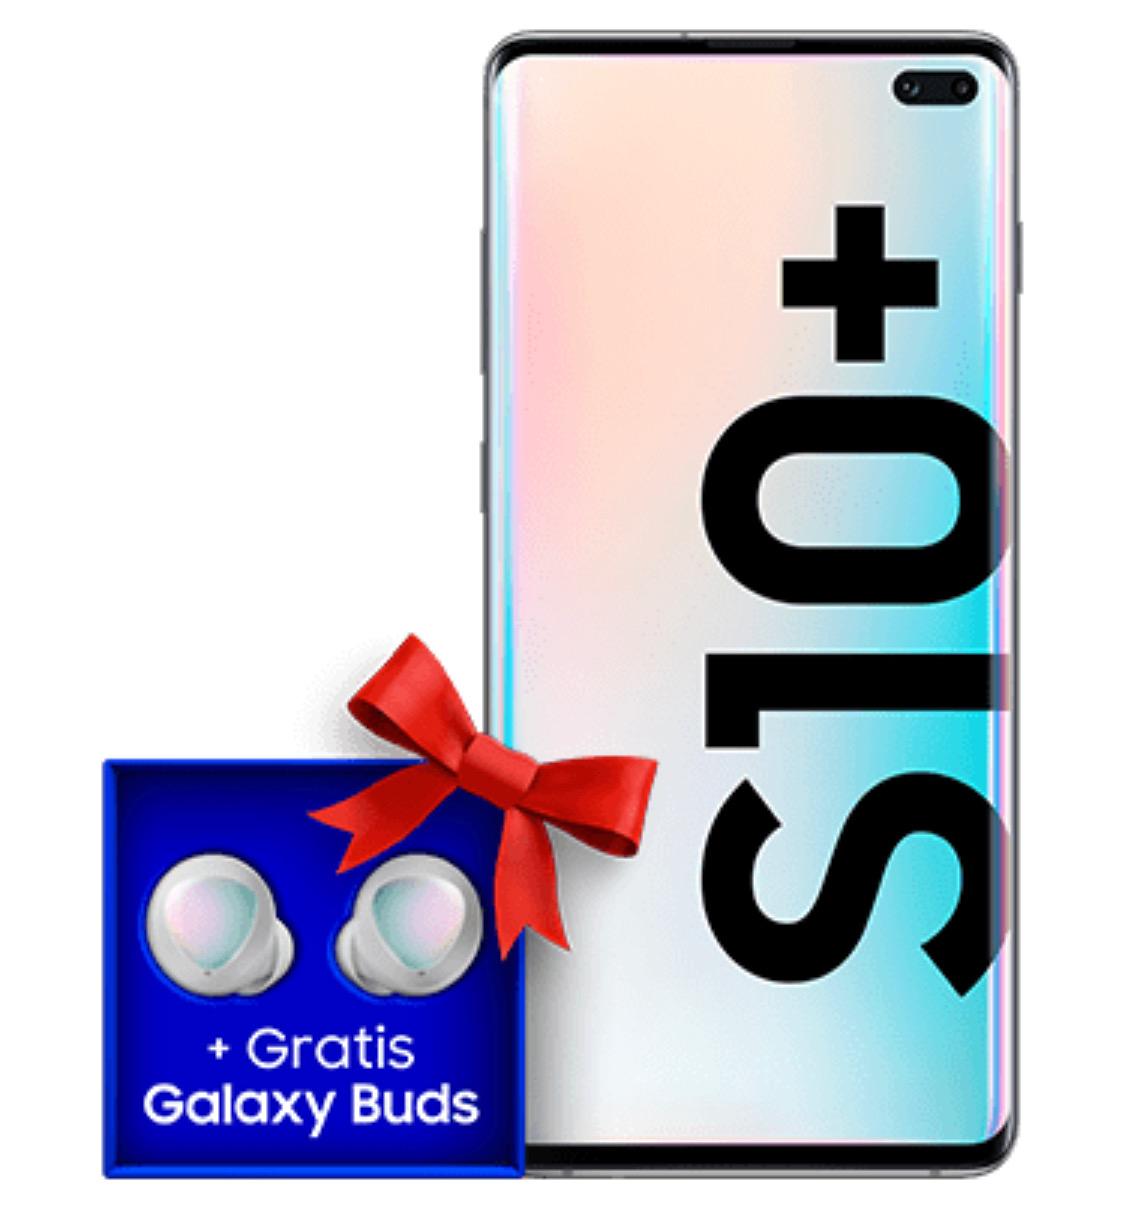 Samsung Galaxy S10+ 512GB & GalaxyBuds GRATIS (lokal Stuttgart)